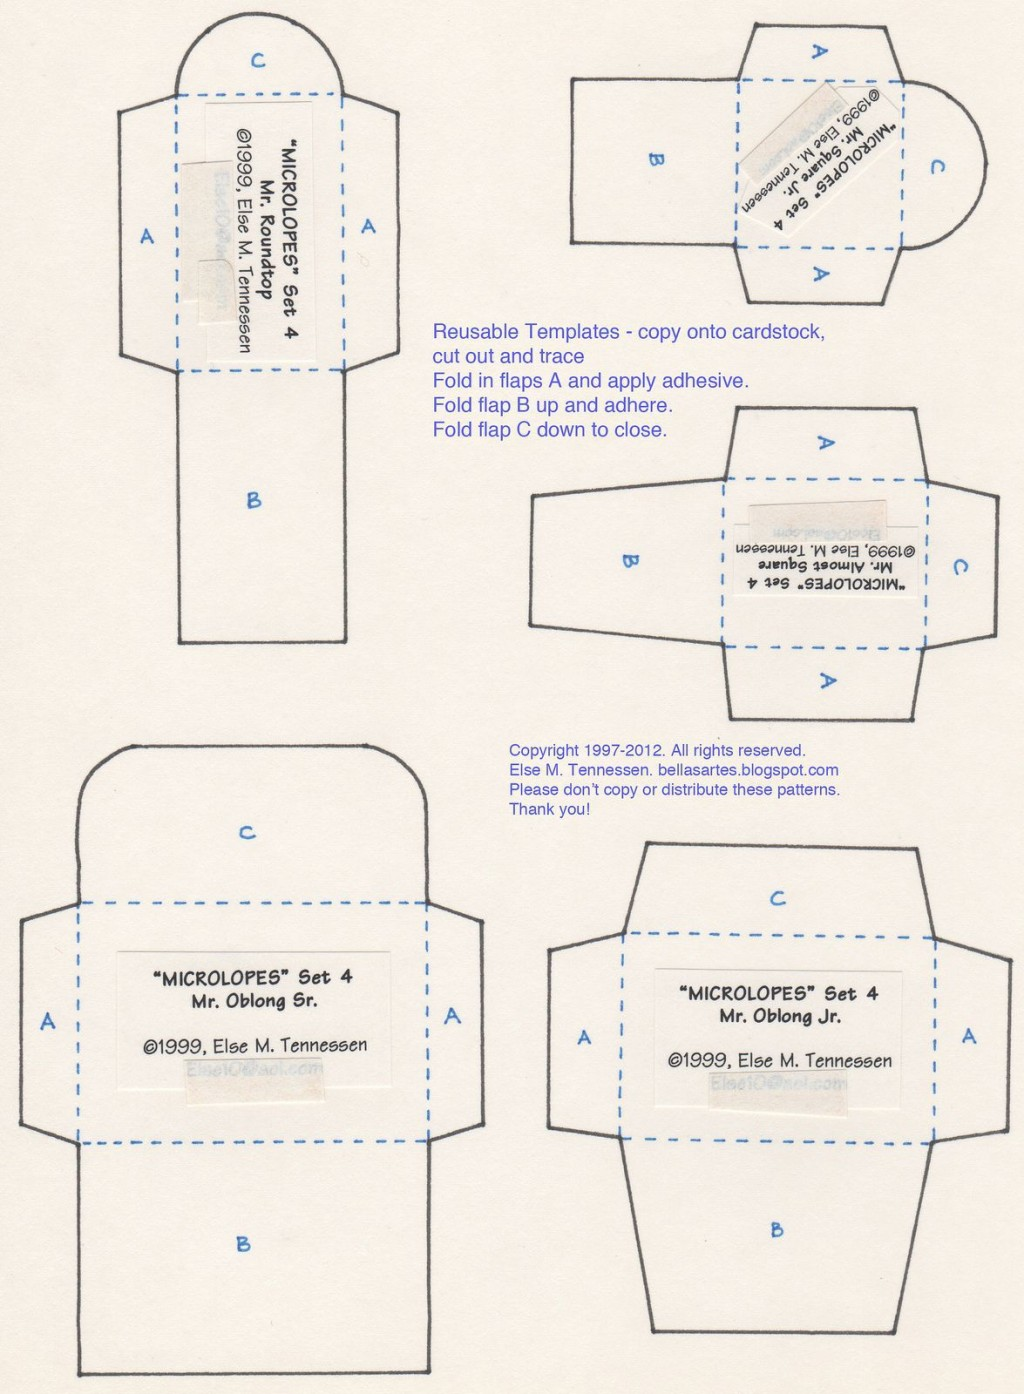 000 Sensational Gift Card Envelope Template Concept  Templates Voucher Diy Free PrintableLarge